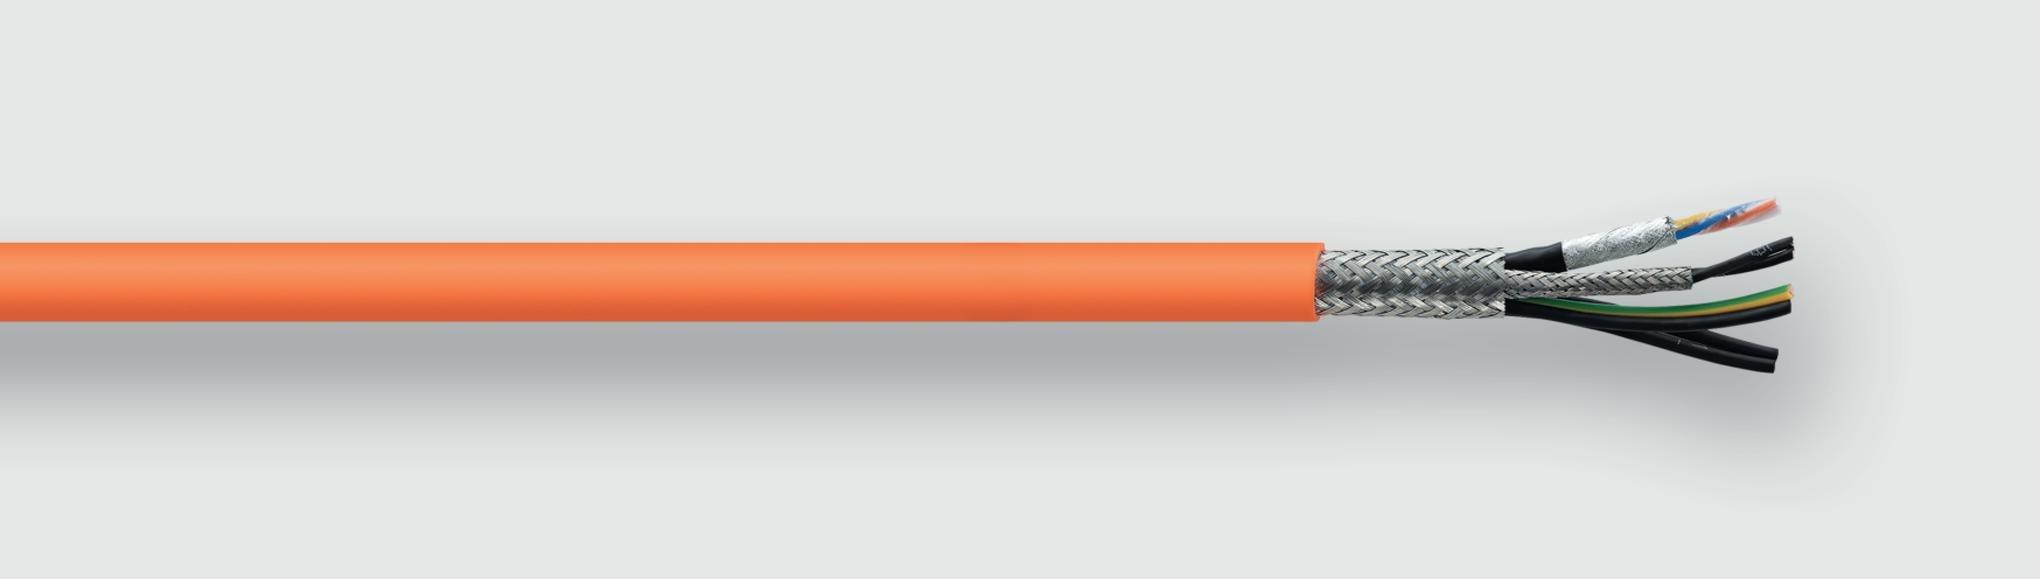 SUPERFLEX® PLUS M (C) PUR SERVO ETHERNET Kombi – Bosch Rexroth